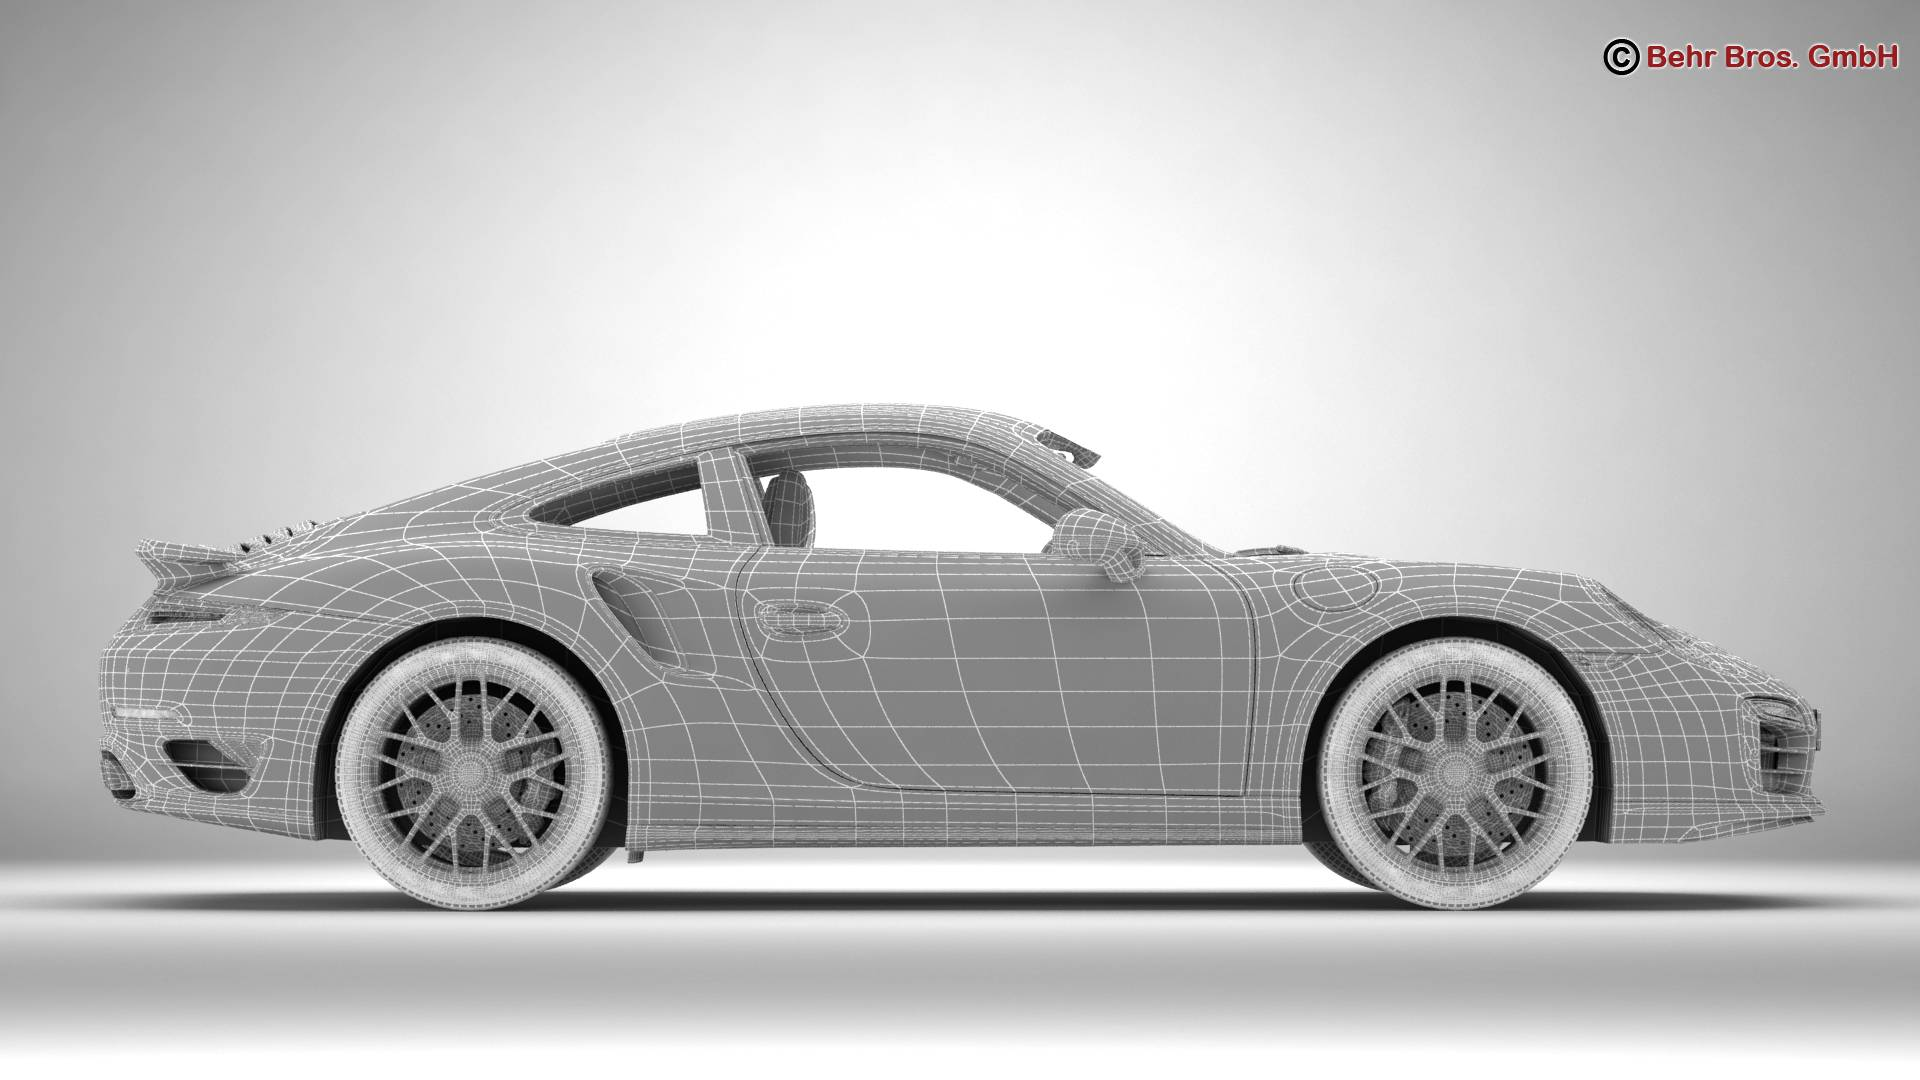 porsche 911 turbo s 2014 3d model 3ds max fbx c4d lwo ma mb obj 212495